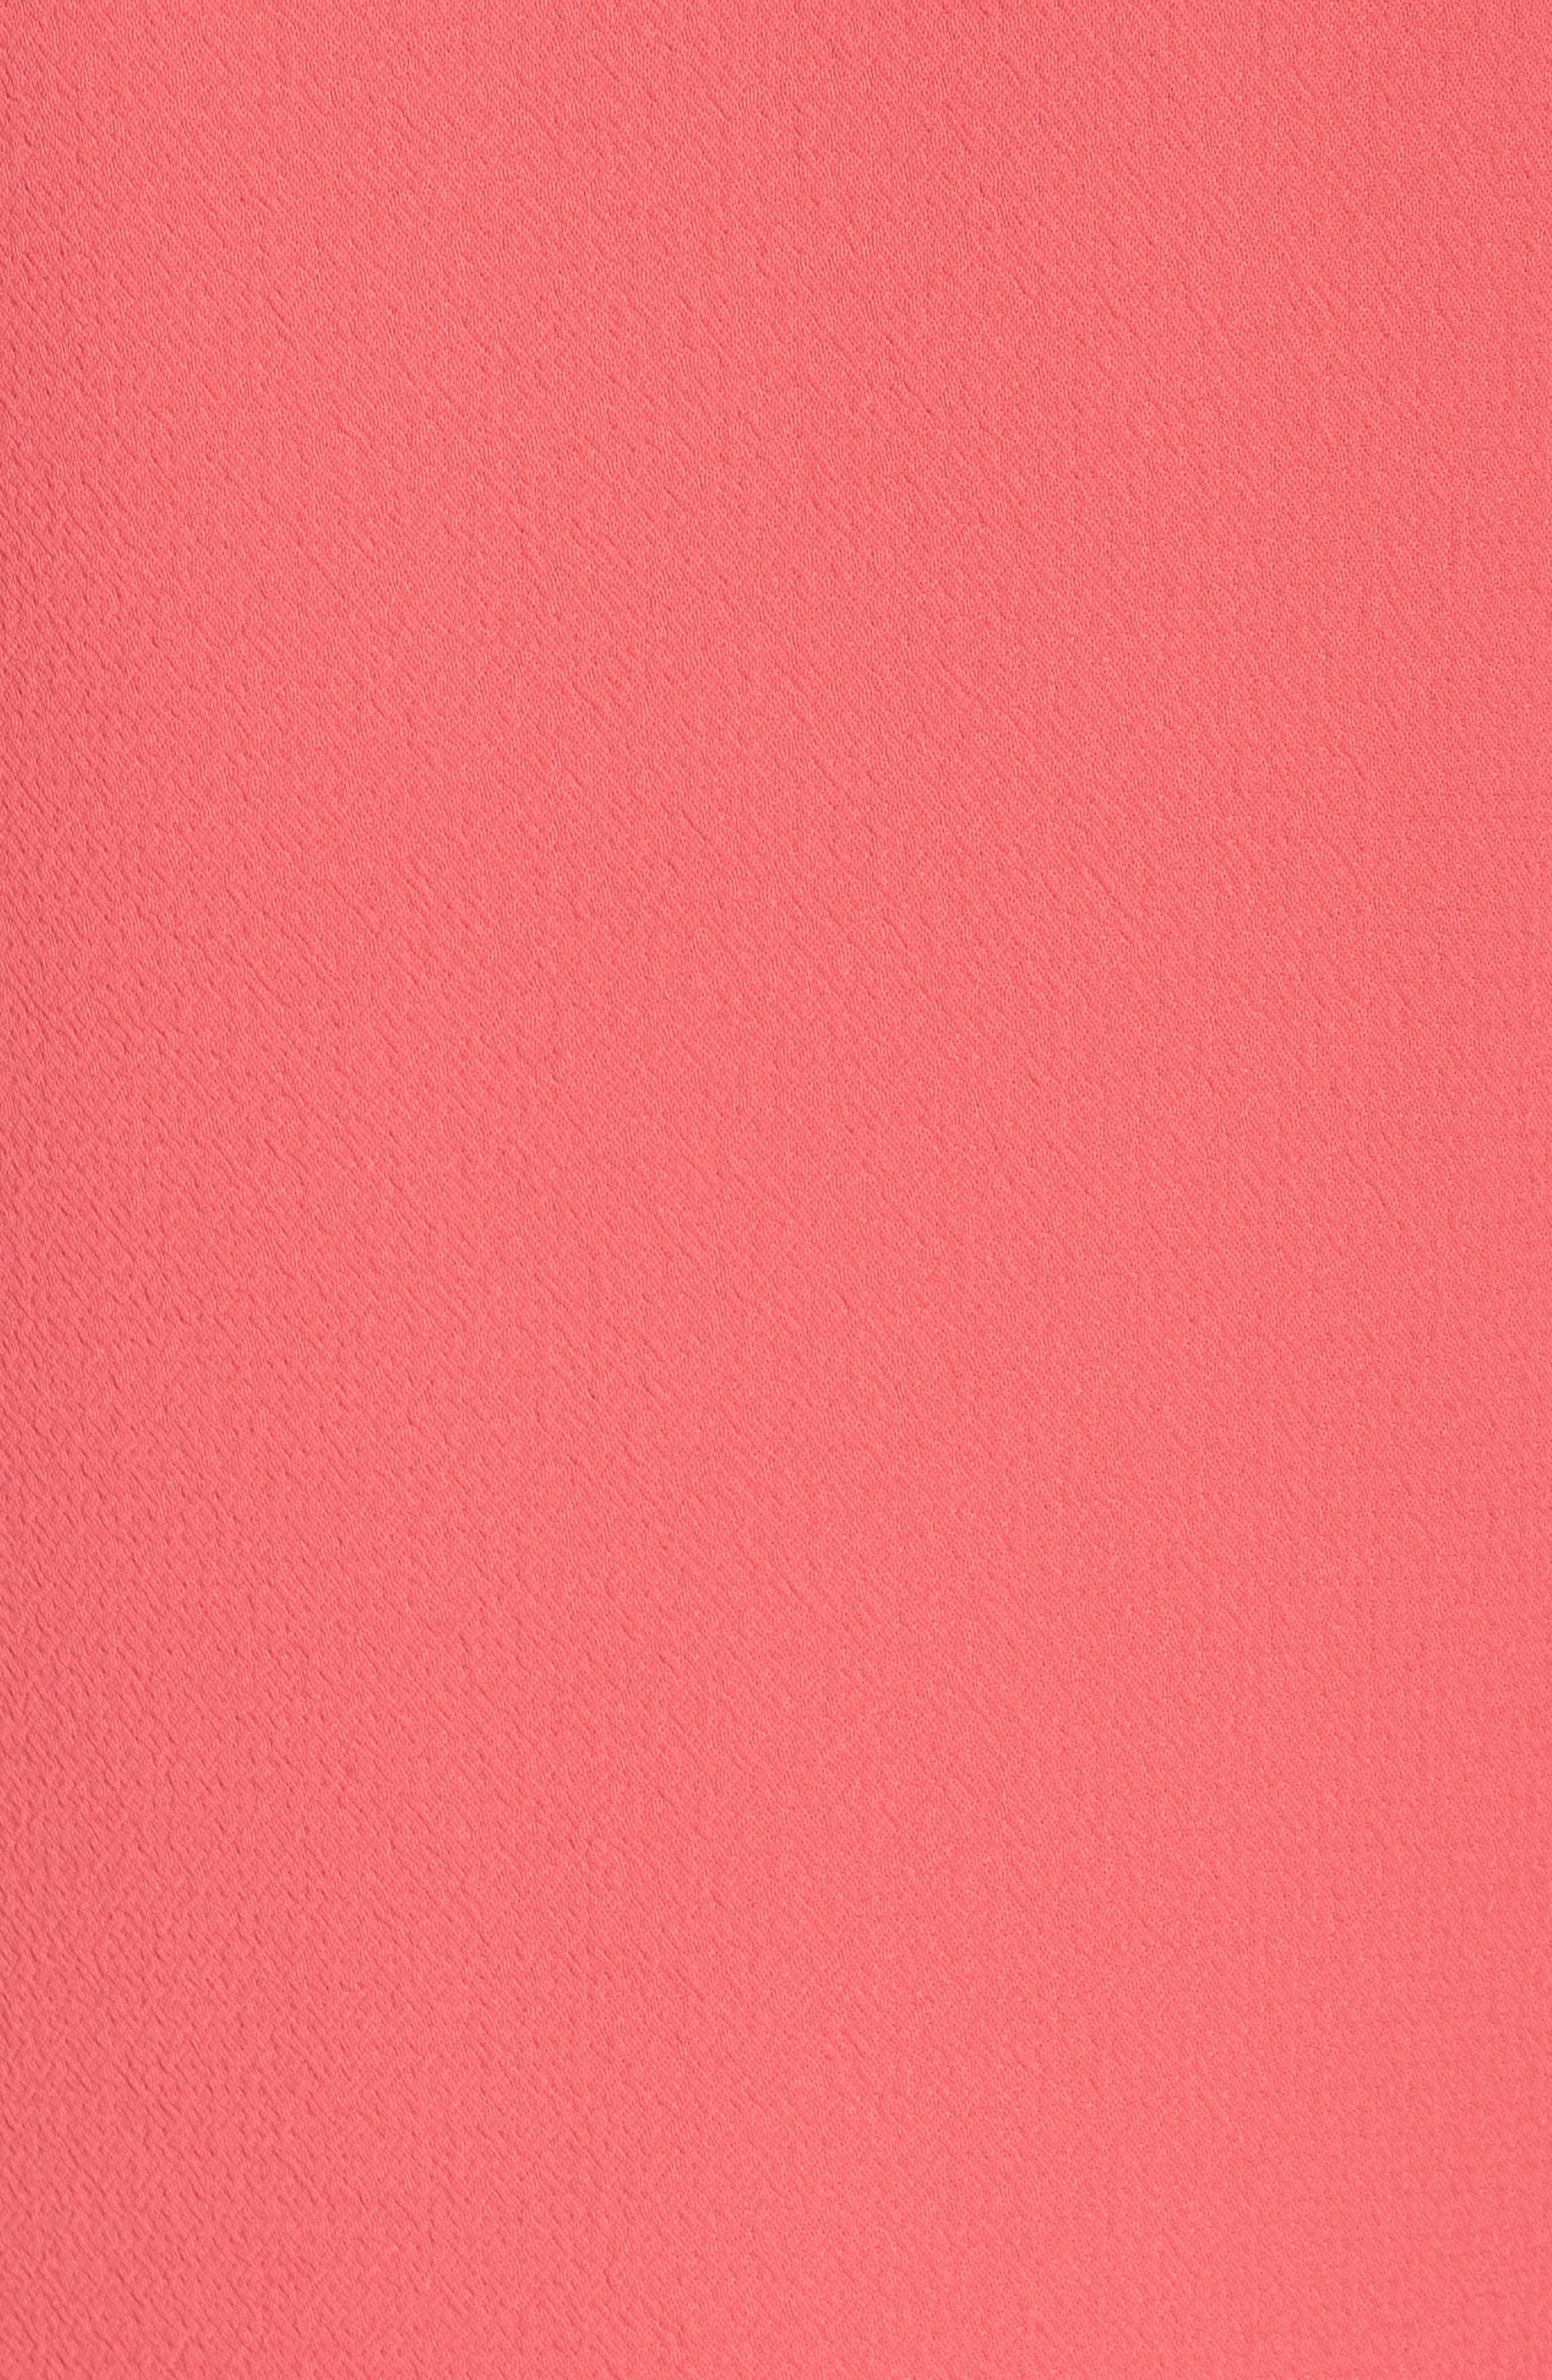 Bow Sheath Dress,                             Alternate thumbnail 10, color,